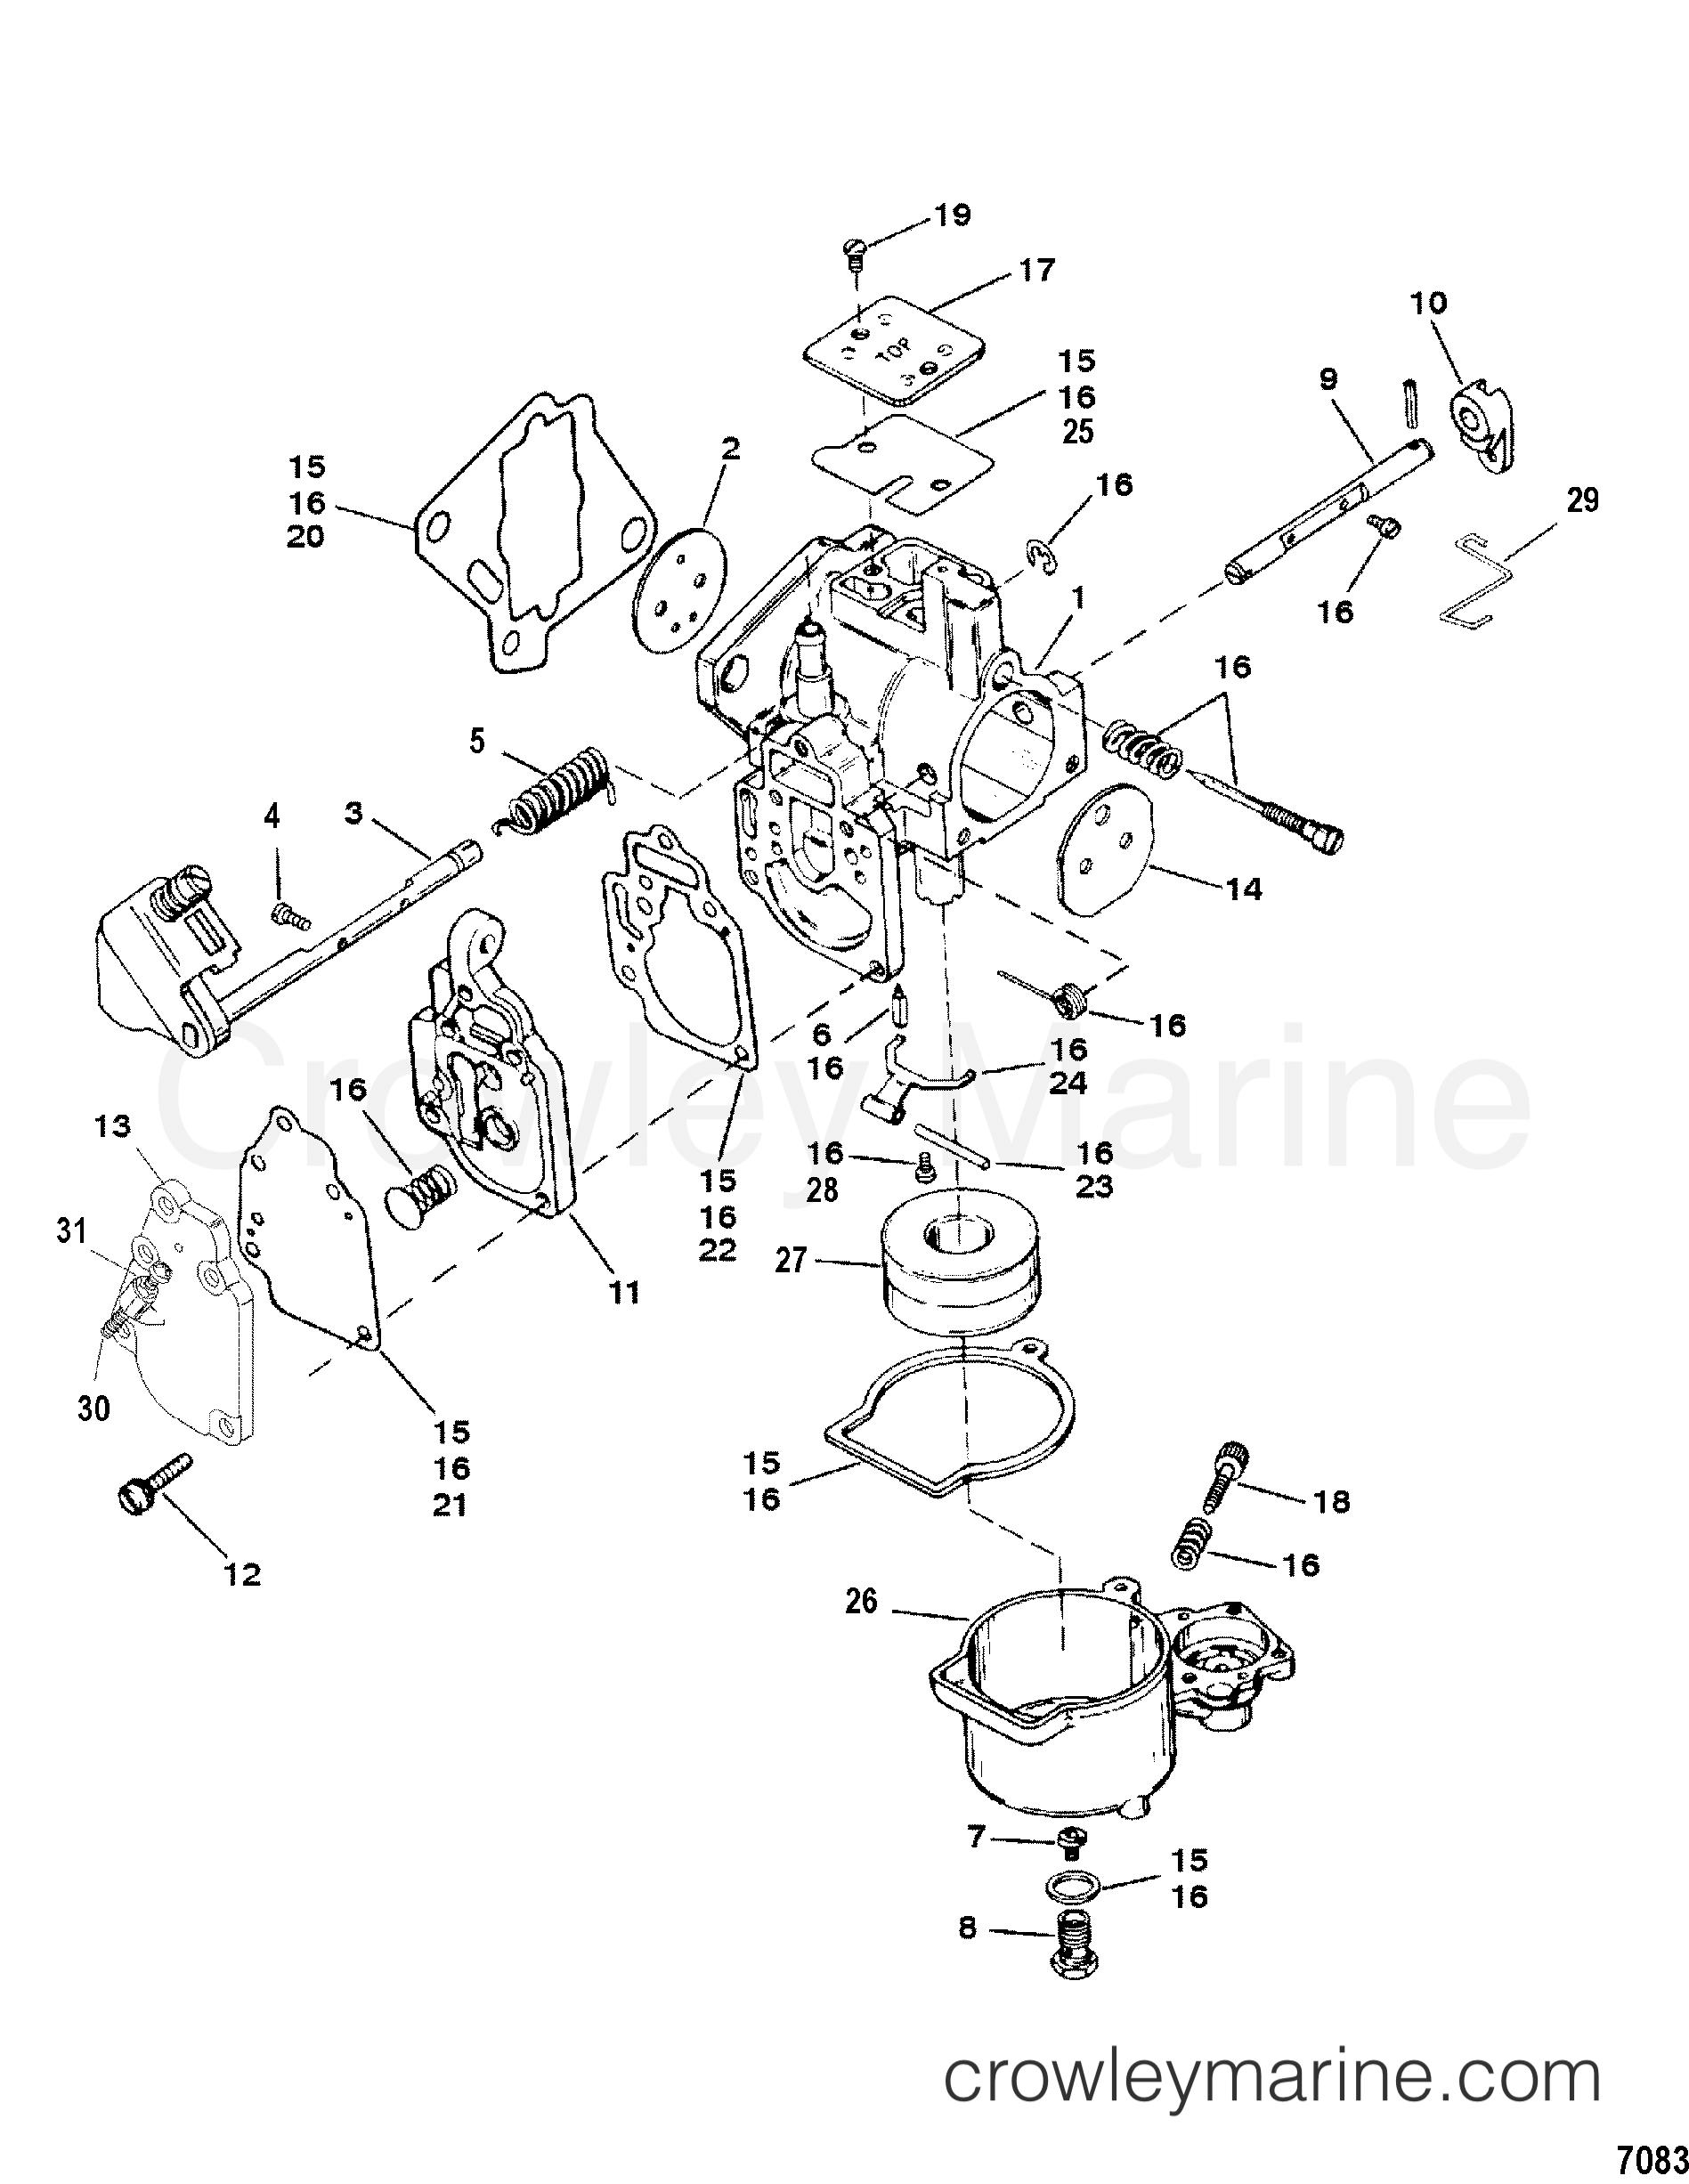 2002 Mariner Outboard 25 [M] - 7025201LD CARBURETOR(SEAPRO/MARATHON 15/25 & SUPER 15) section